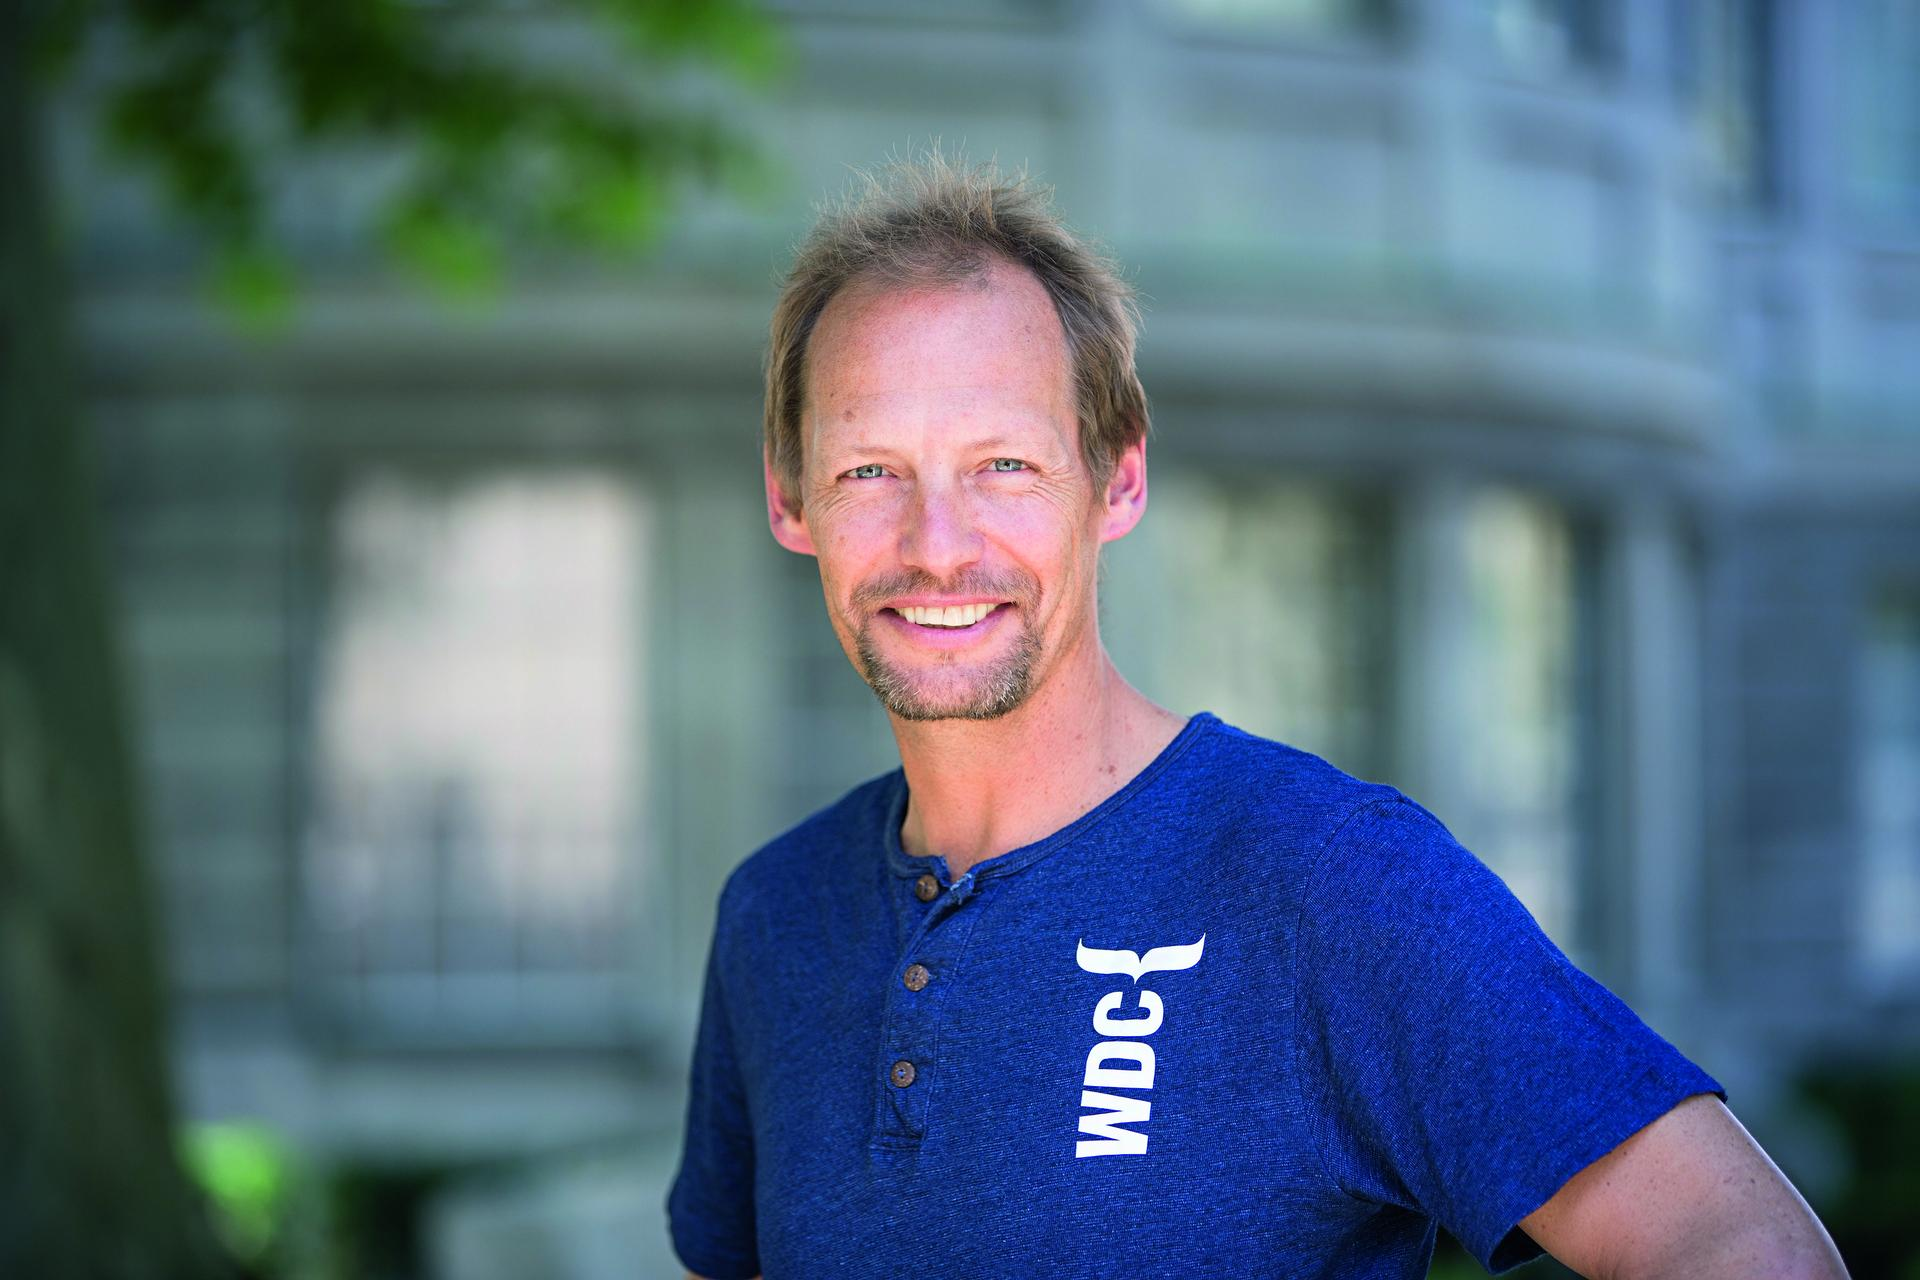 Fabian Ritter, WDC marine biologist